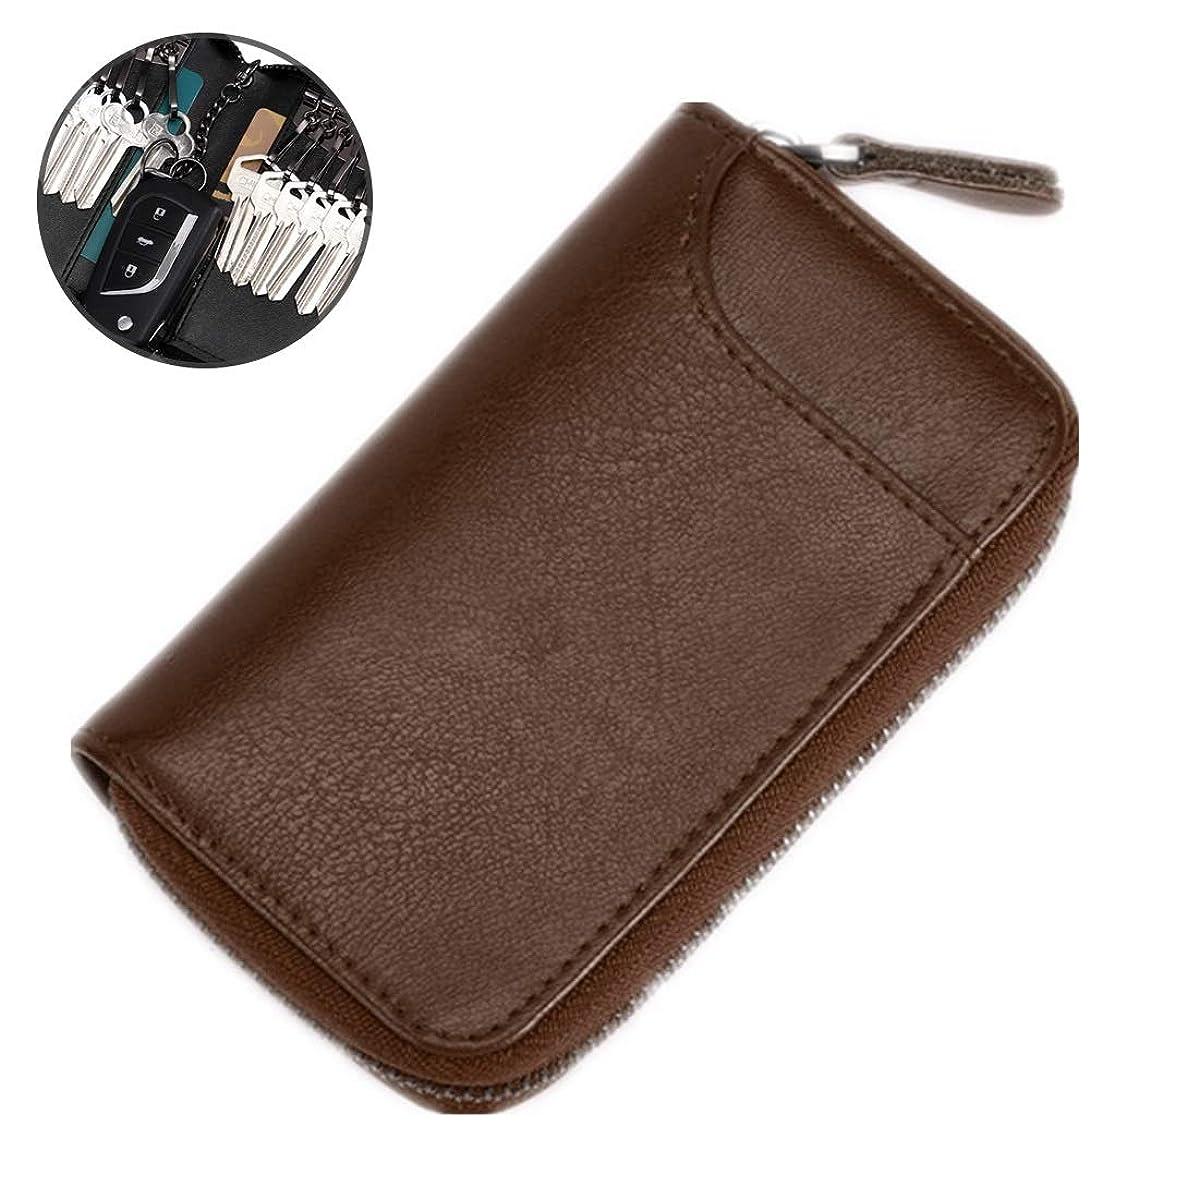 Large Zipper Leather Car Key Case by BAKUN, Key Holder Key Organizer Wallet, with 16 Hooks(Brown)